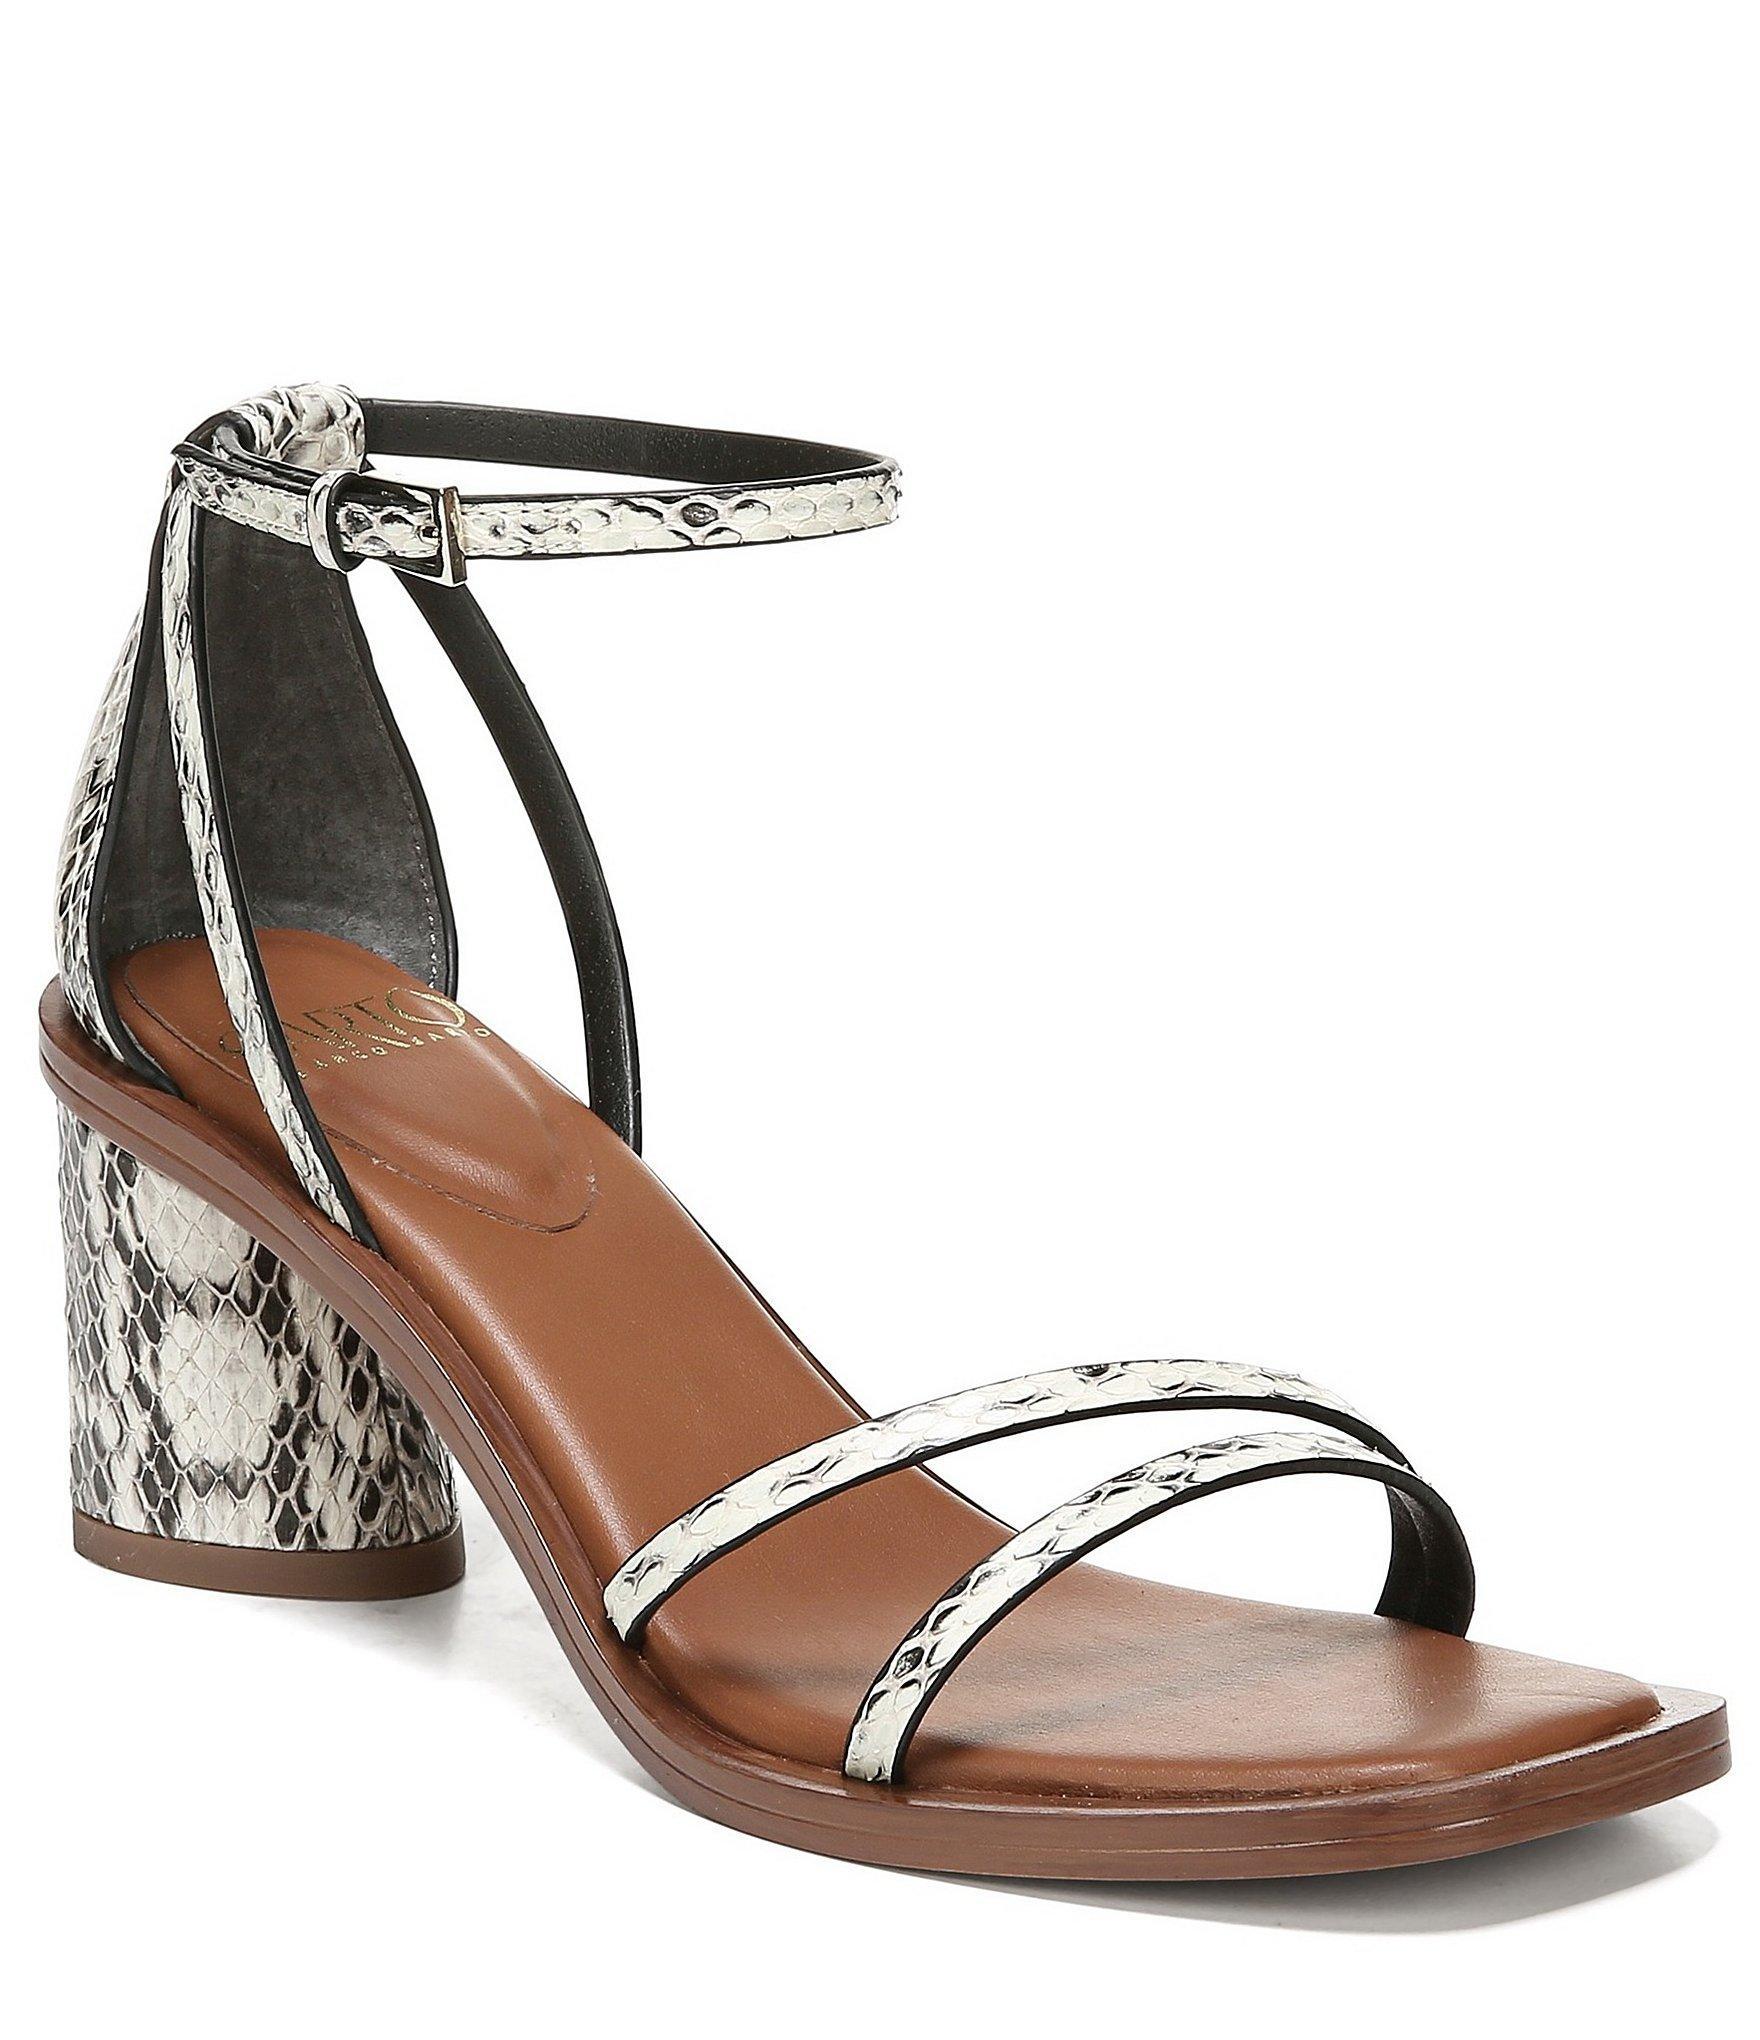 7f470792cb018 Franco Sarto. Women s Black Sarto By Ronelle 2 Snake Print Leather Block  Heel Sandals